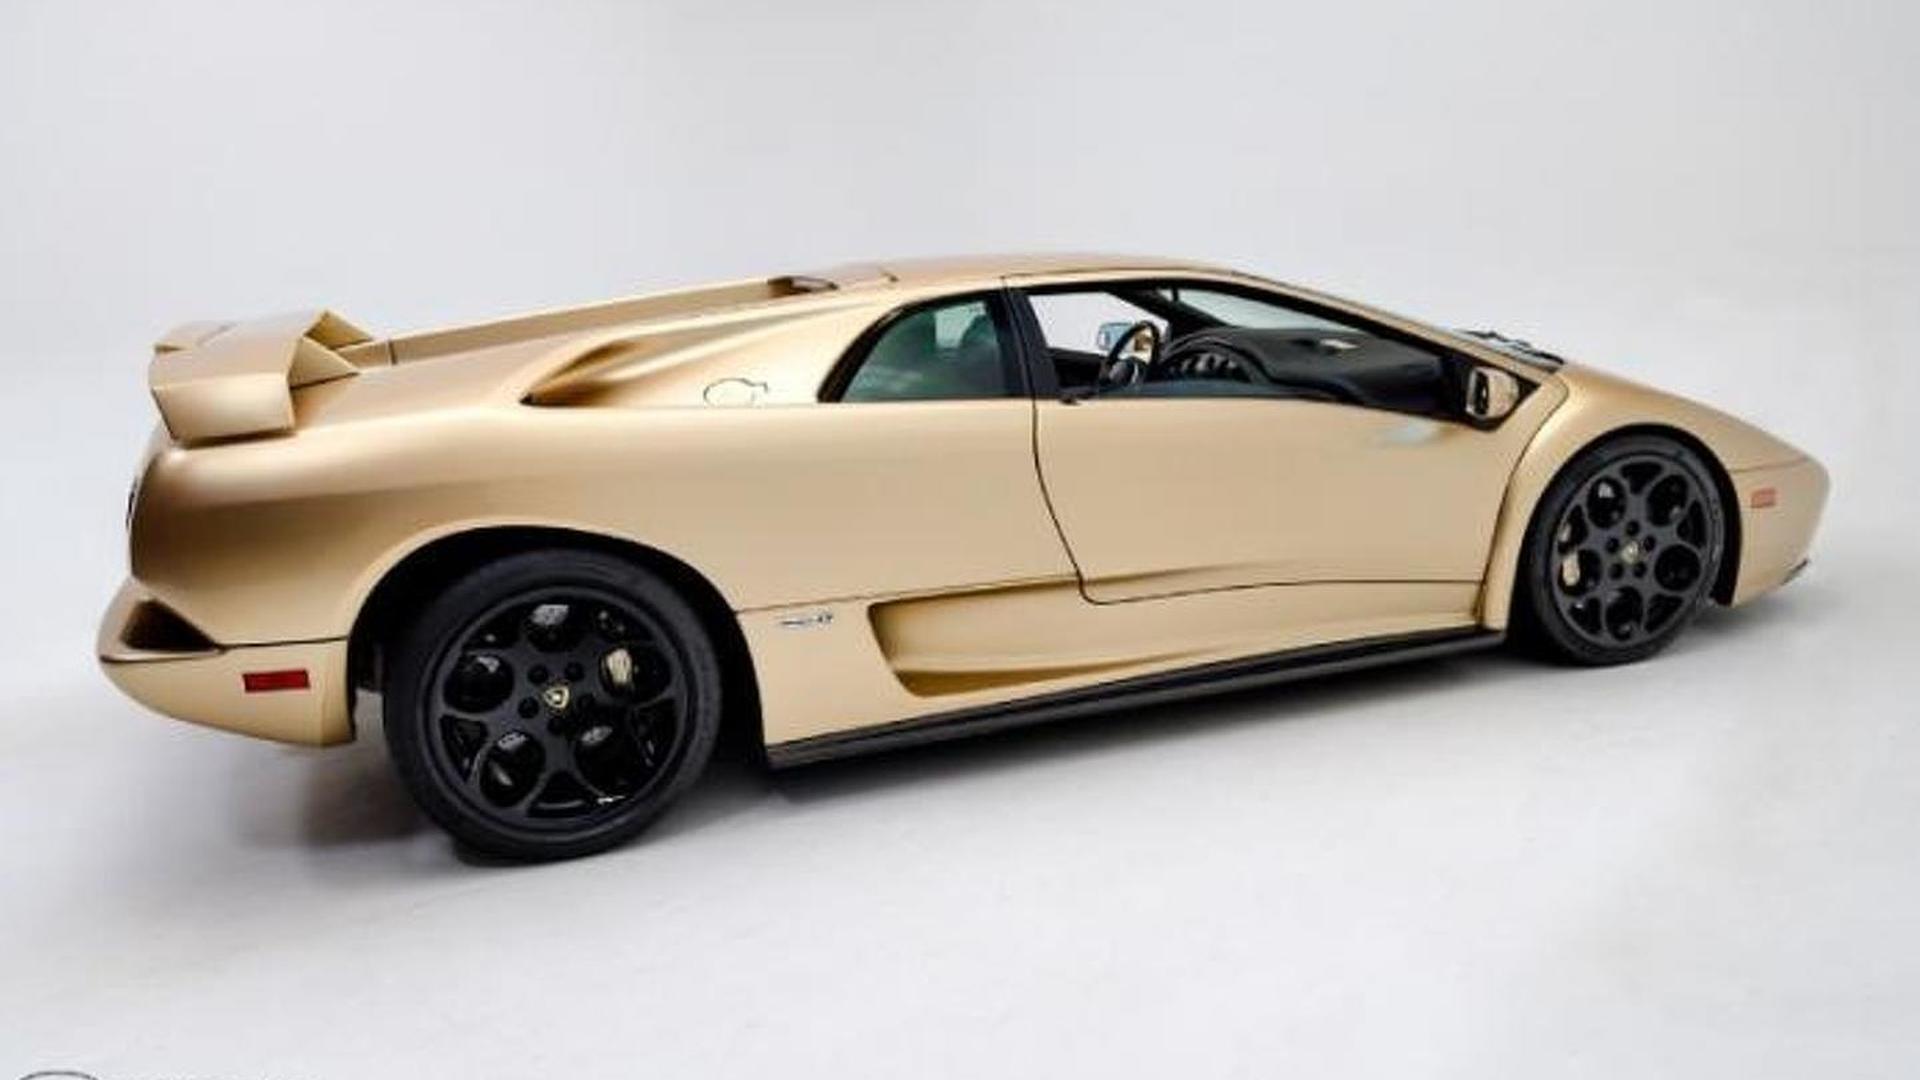 Коллекционный суперкар Lamborghini Diablo 6.0 SE